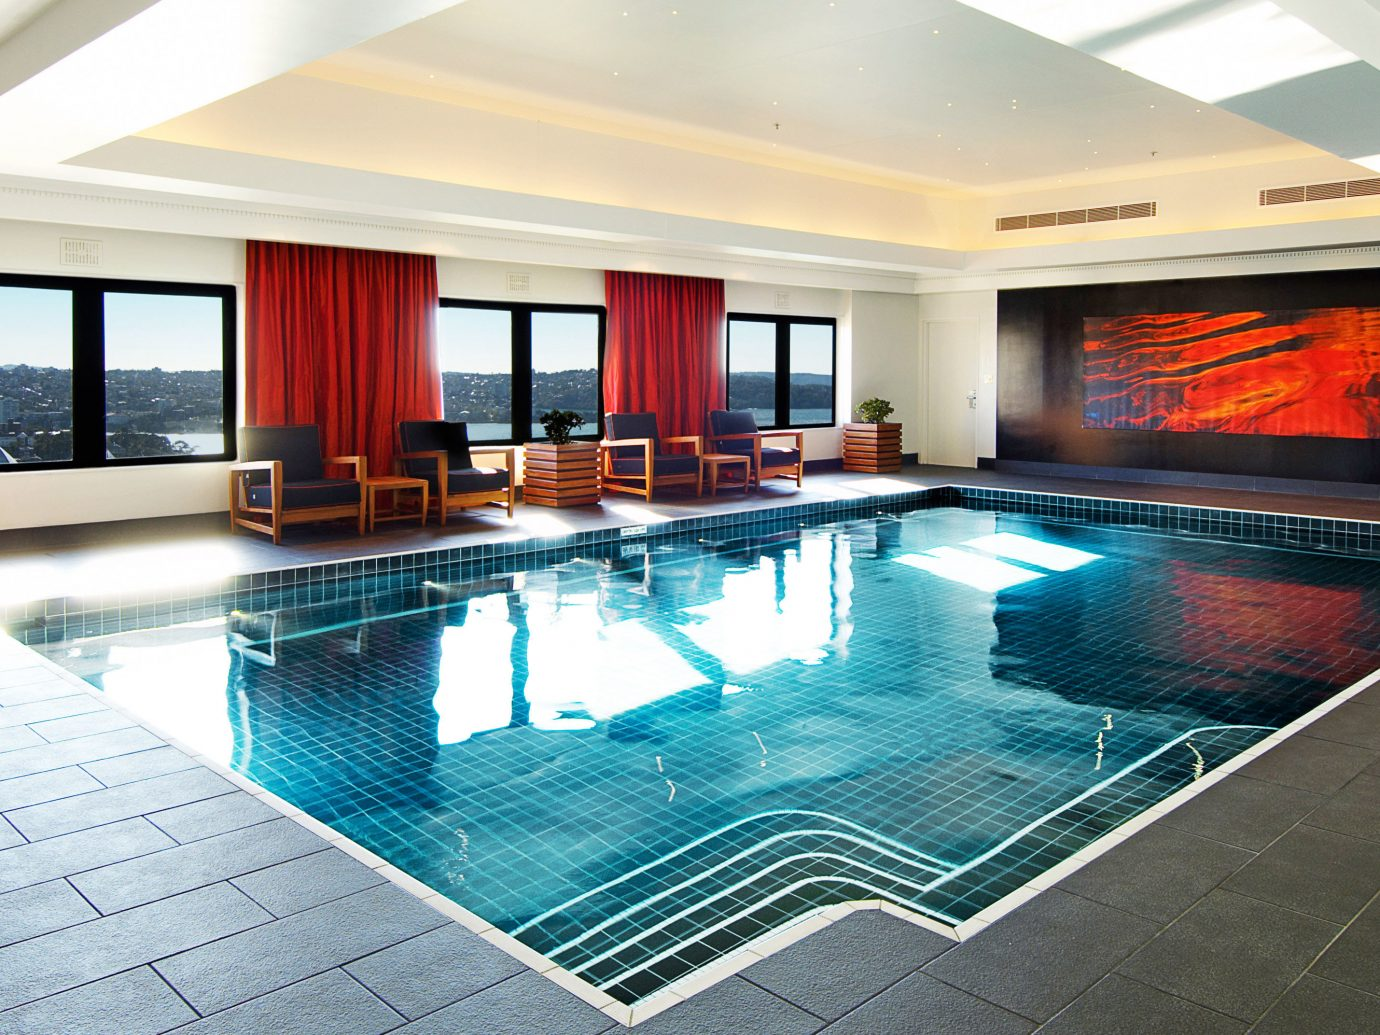 Hotels Living Lounge Luxury Pool indoor floor ceiling swimming pool property room window leisure estate real estate Resort interior design home condominium furniture Villa